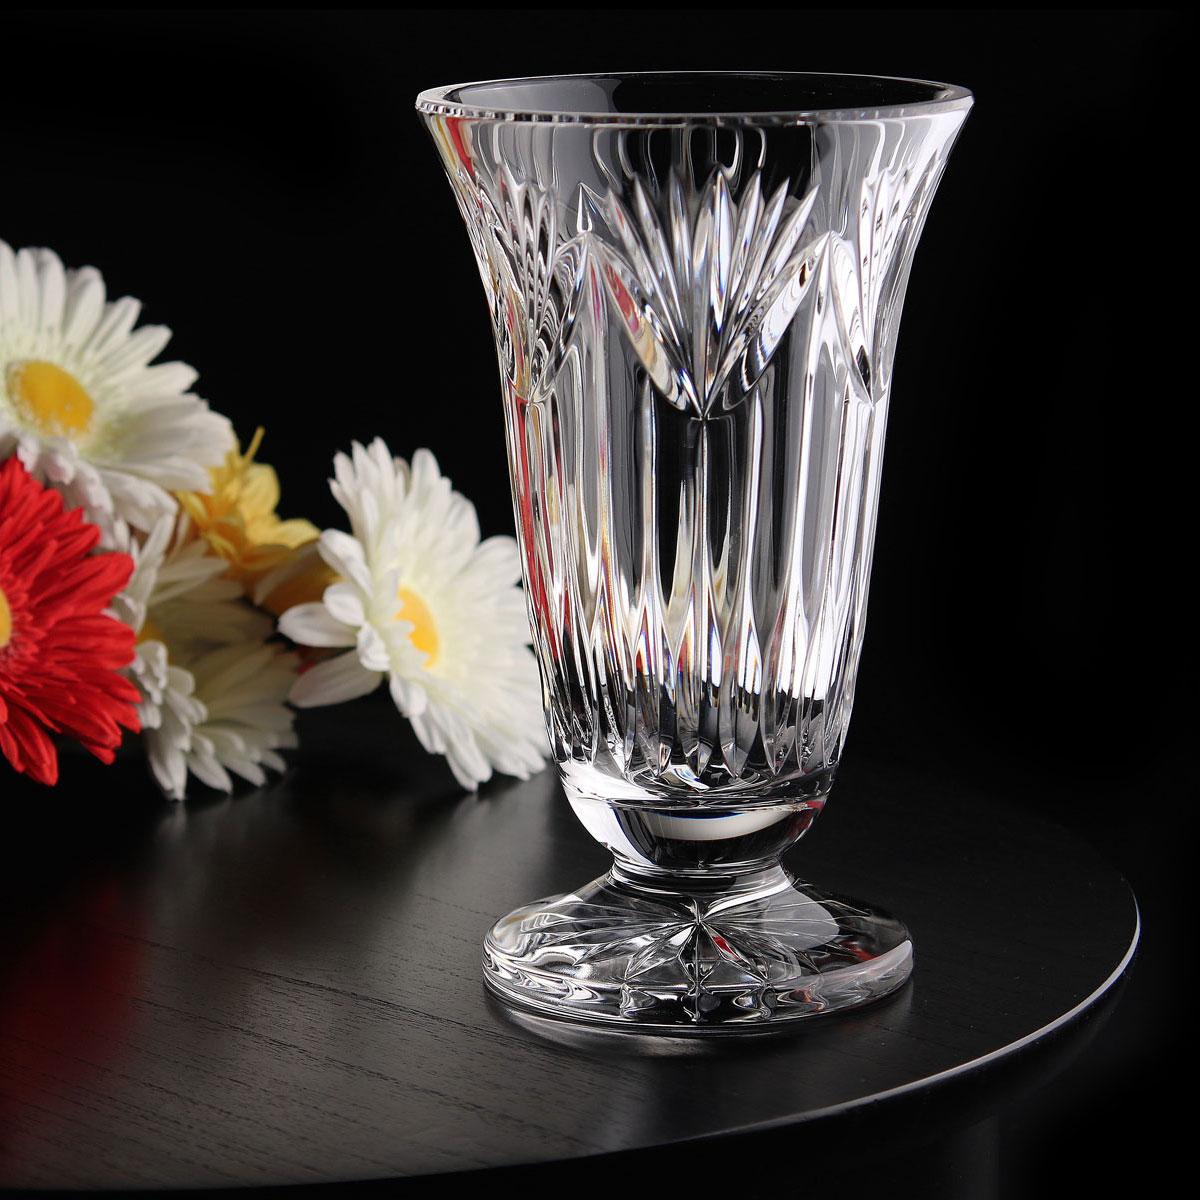 Cashs Ireland, Thistle Footed Crystal Vase